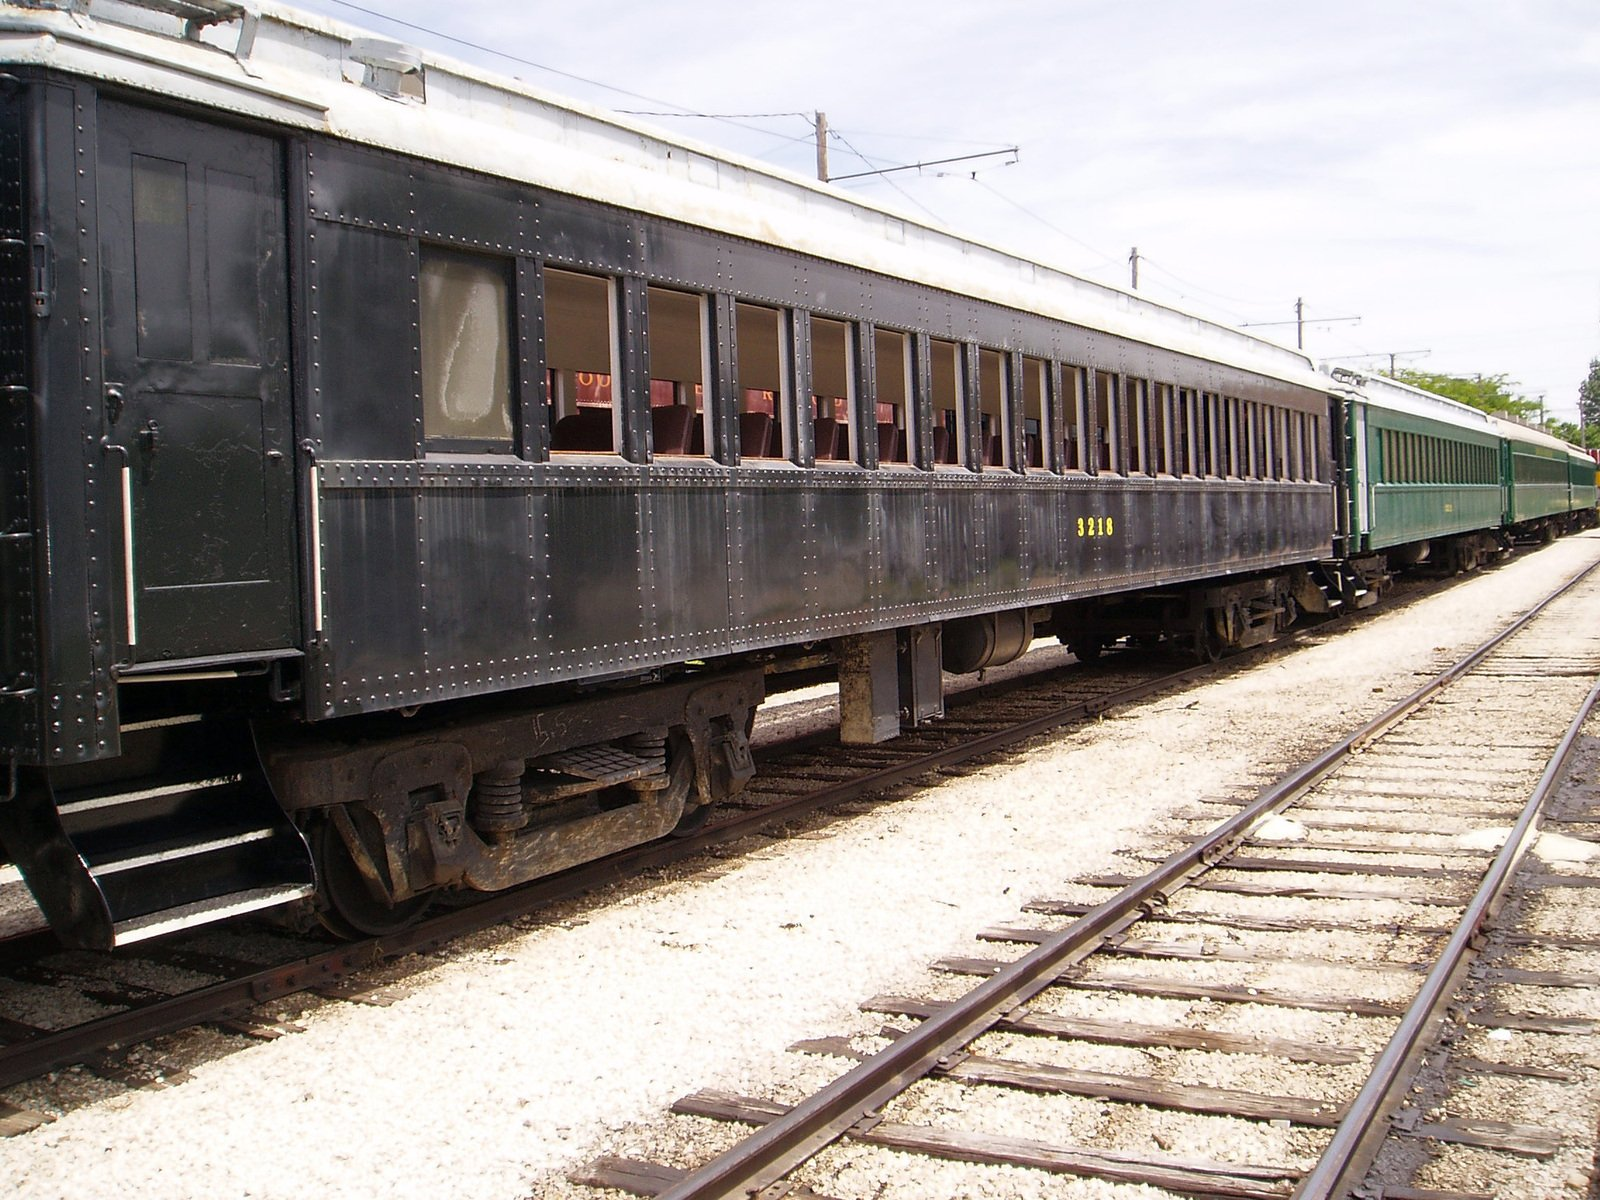 Train Car Perspective